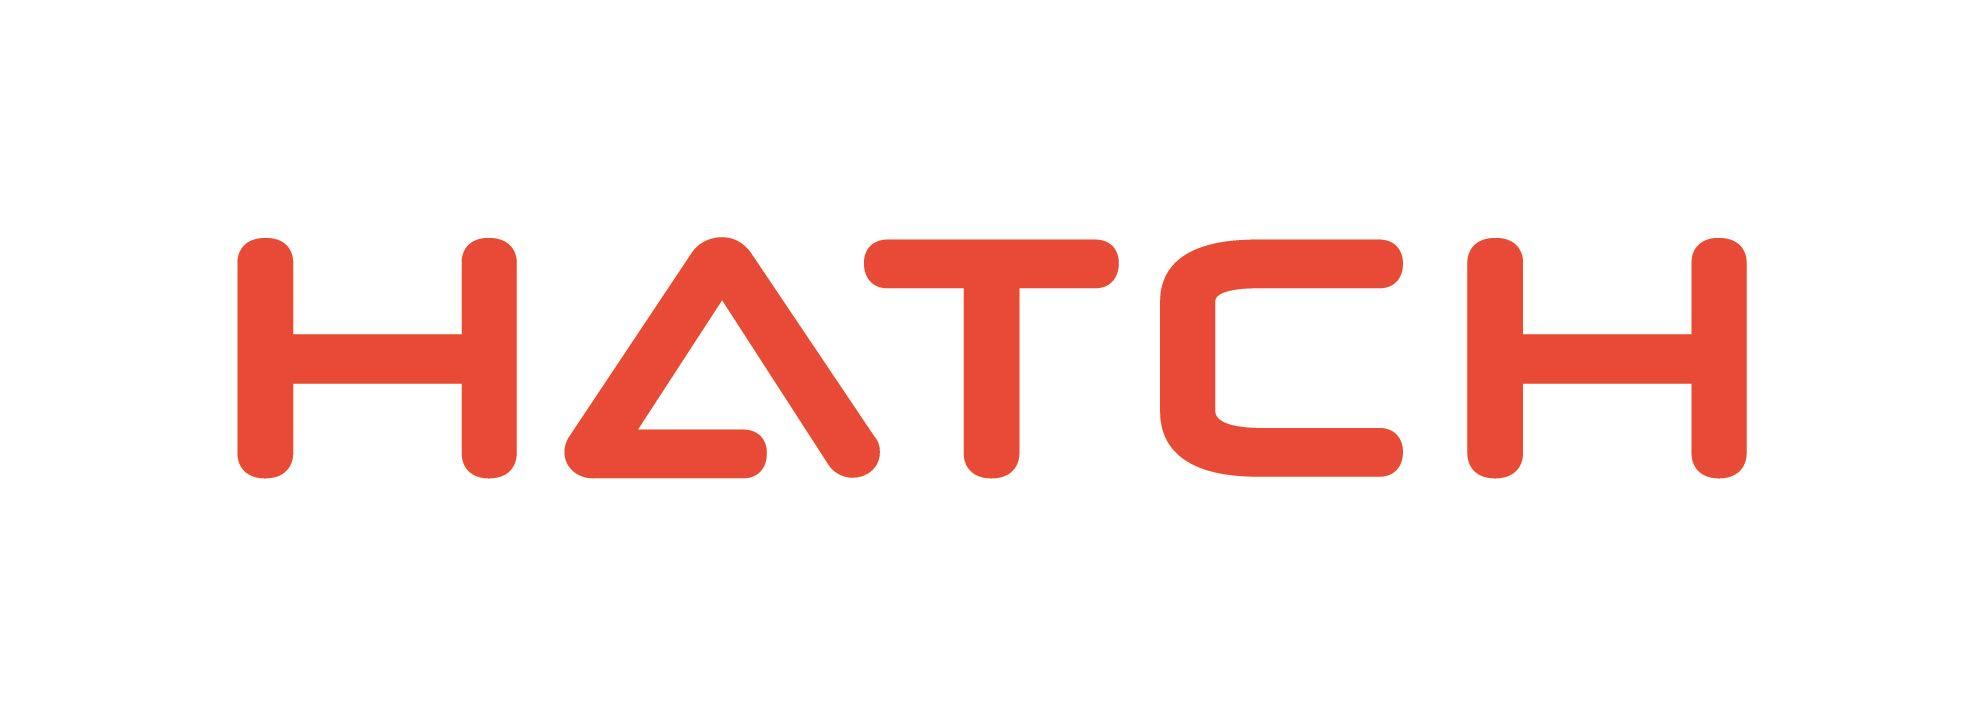 hatch case study